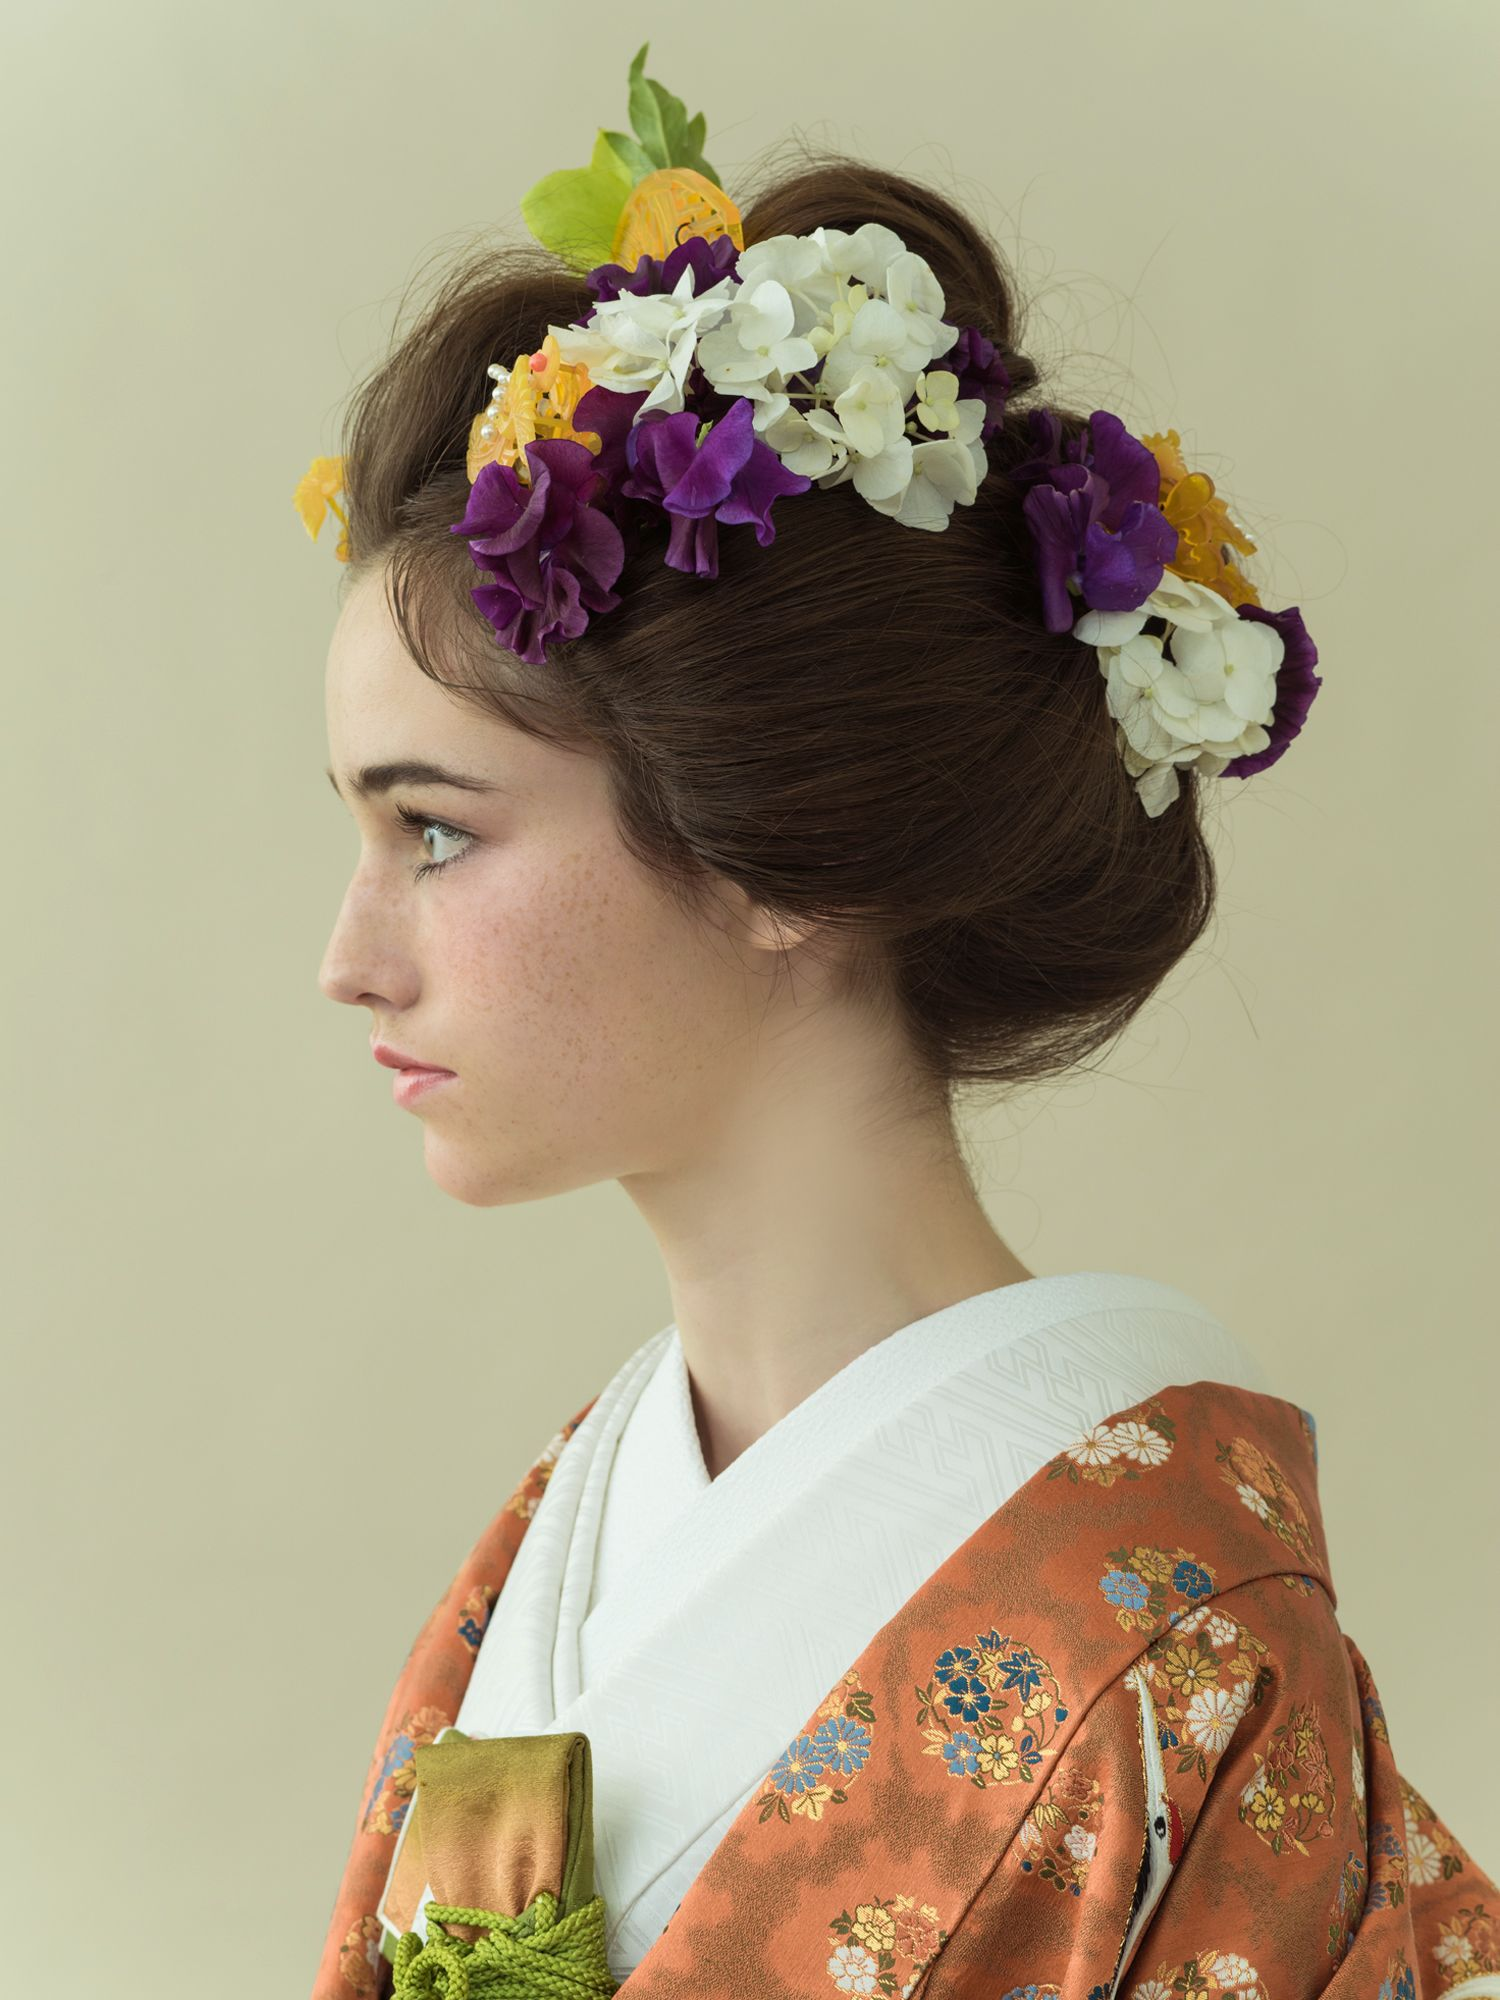 和装 着物 / japanese modern style wedding hairstyle